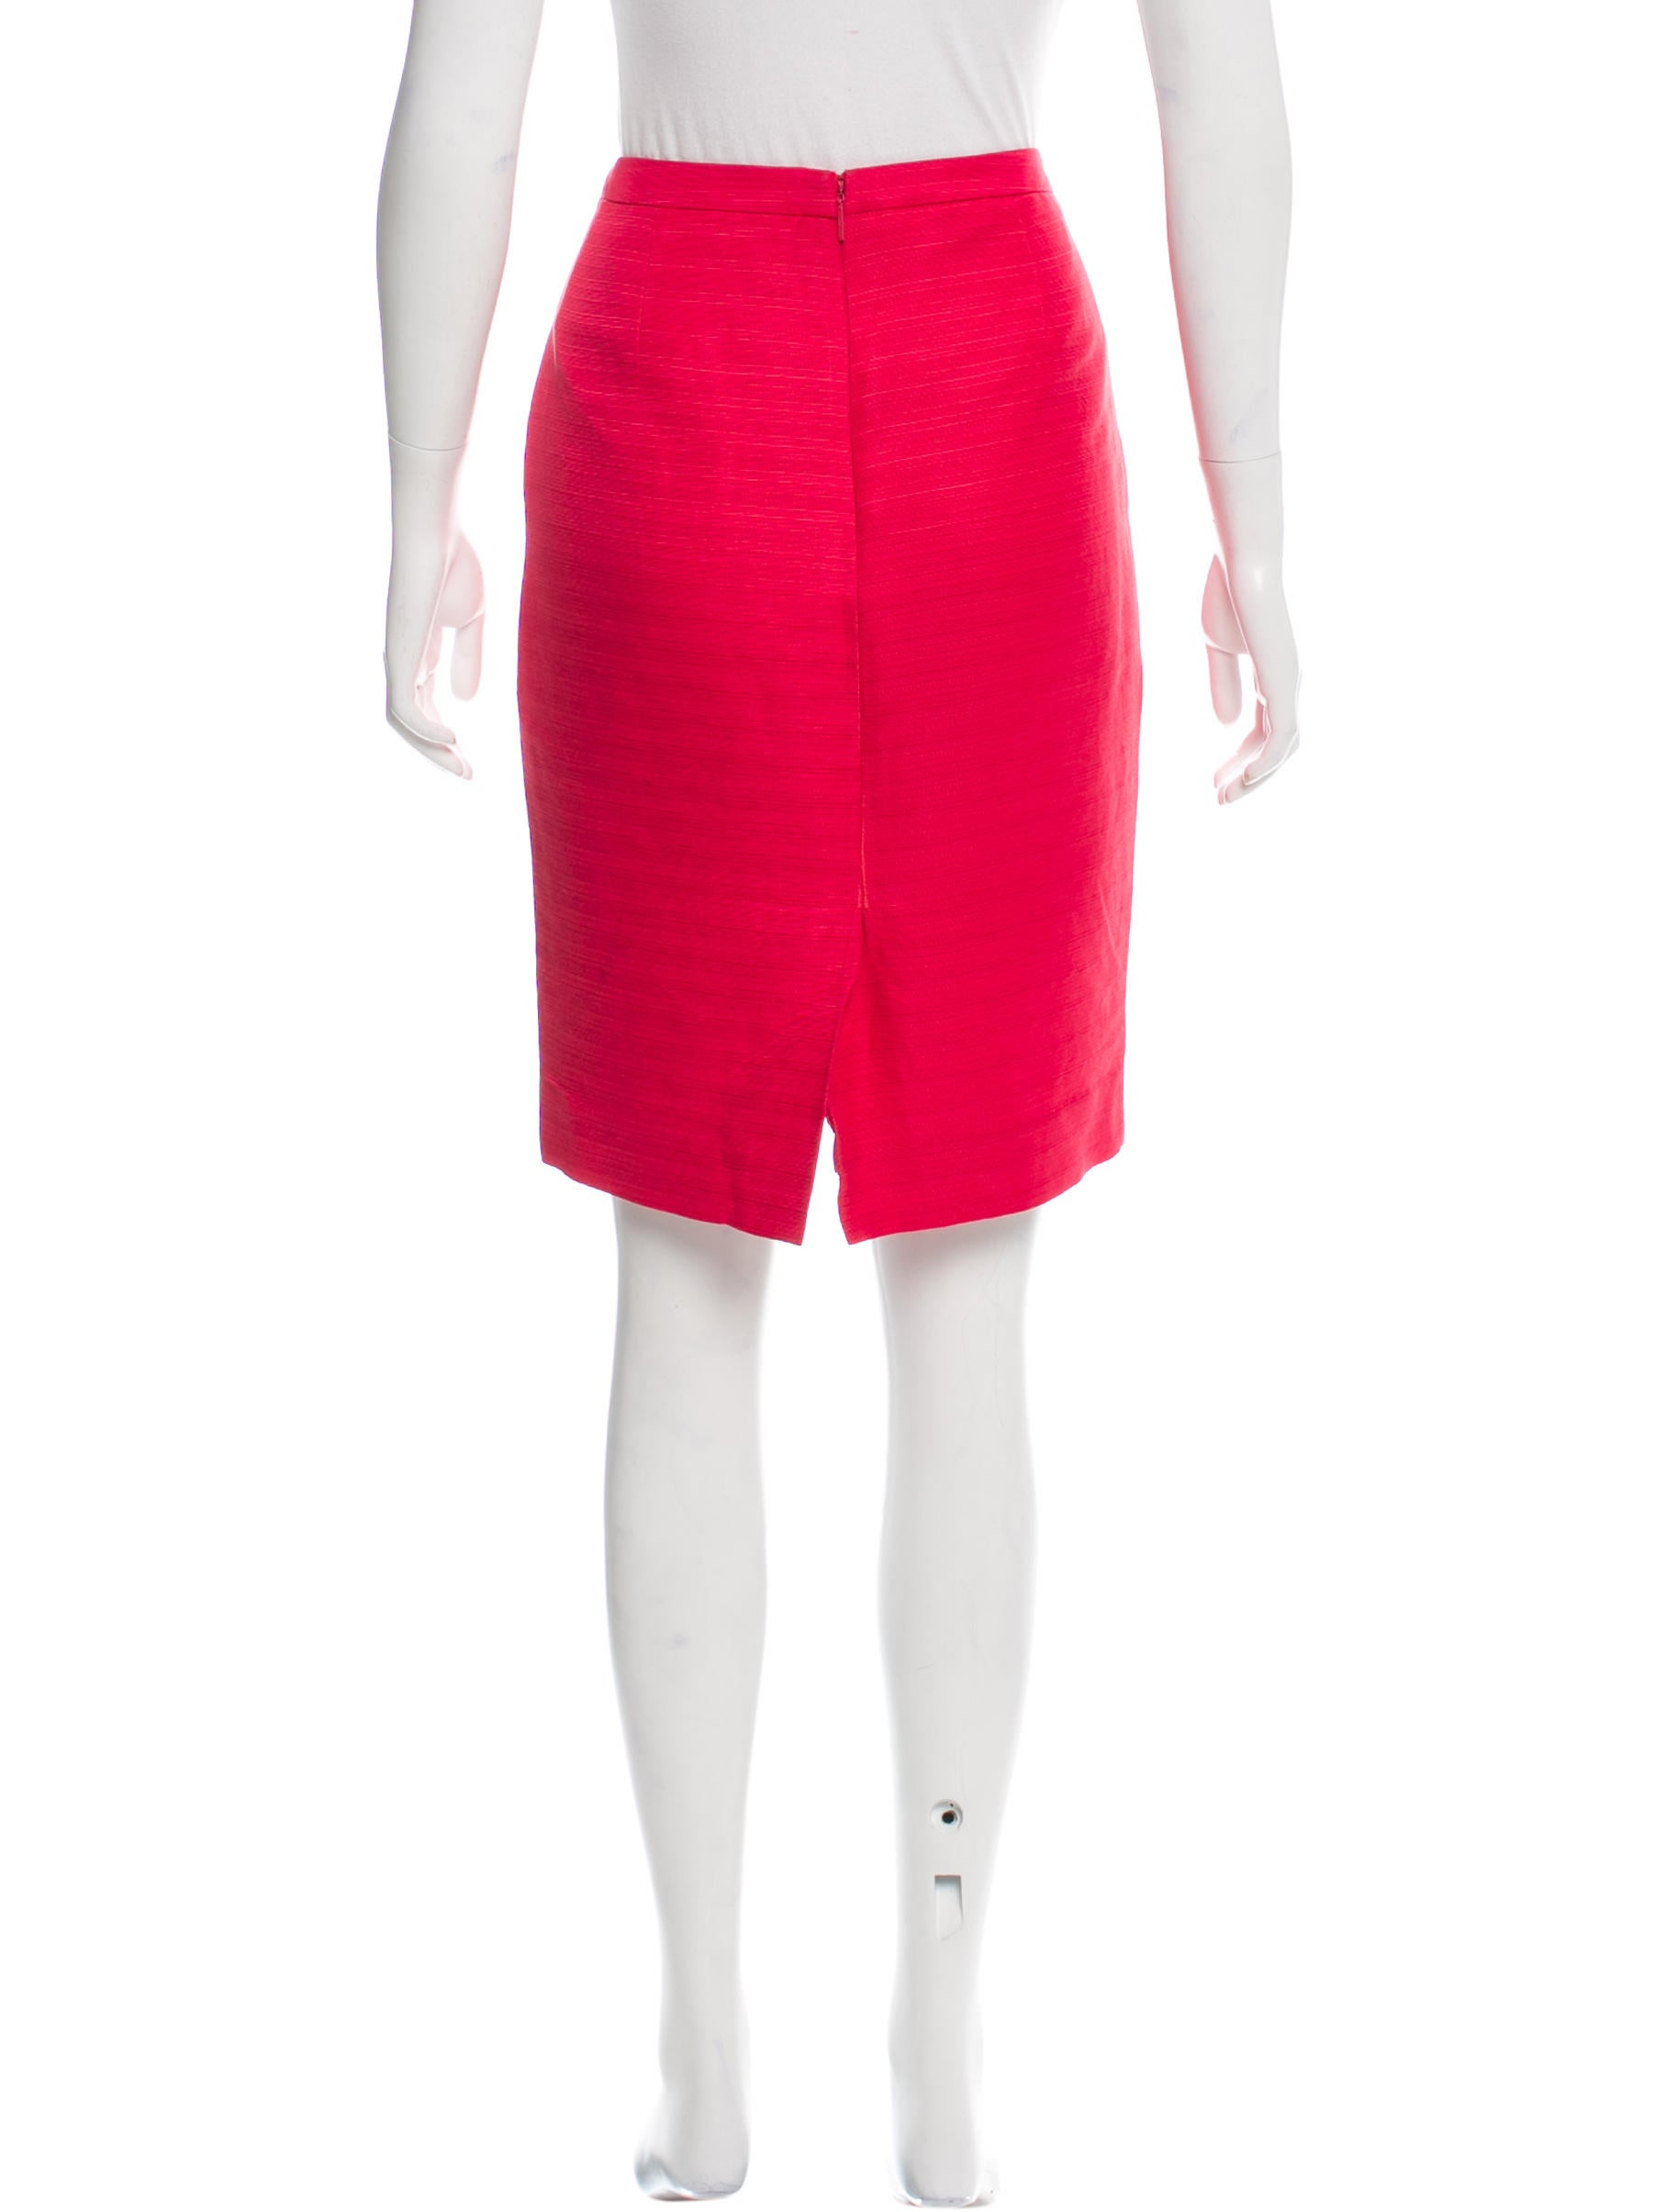 burch knee length pencil skirt clothing wto89042